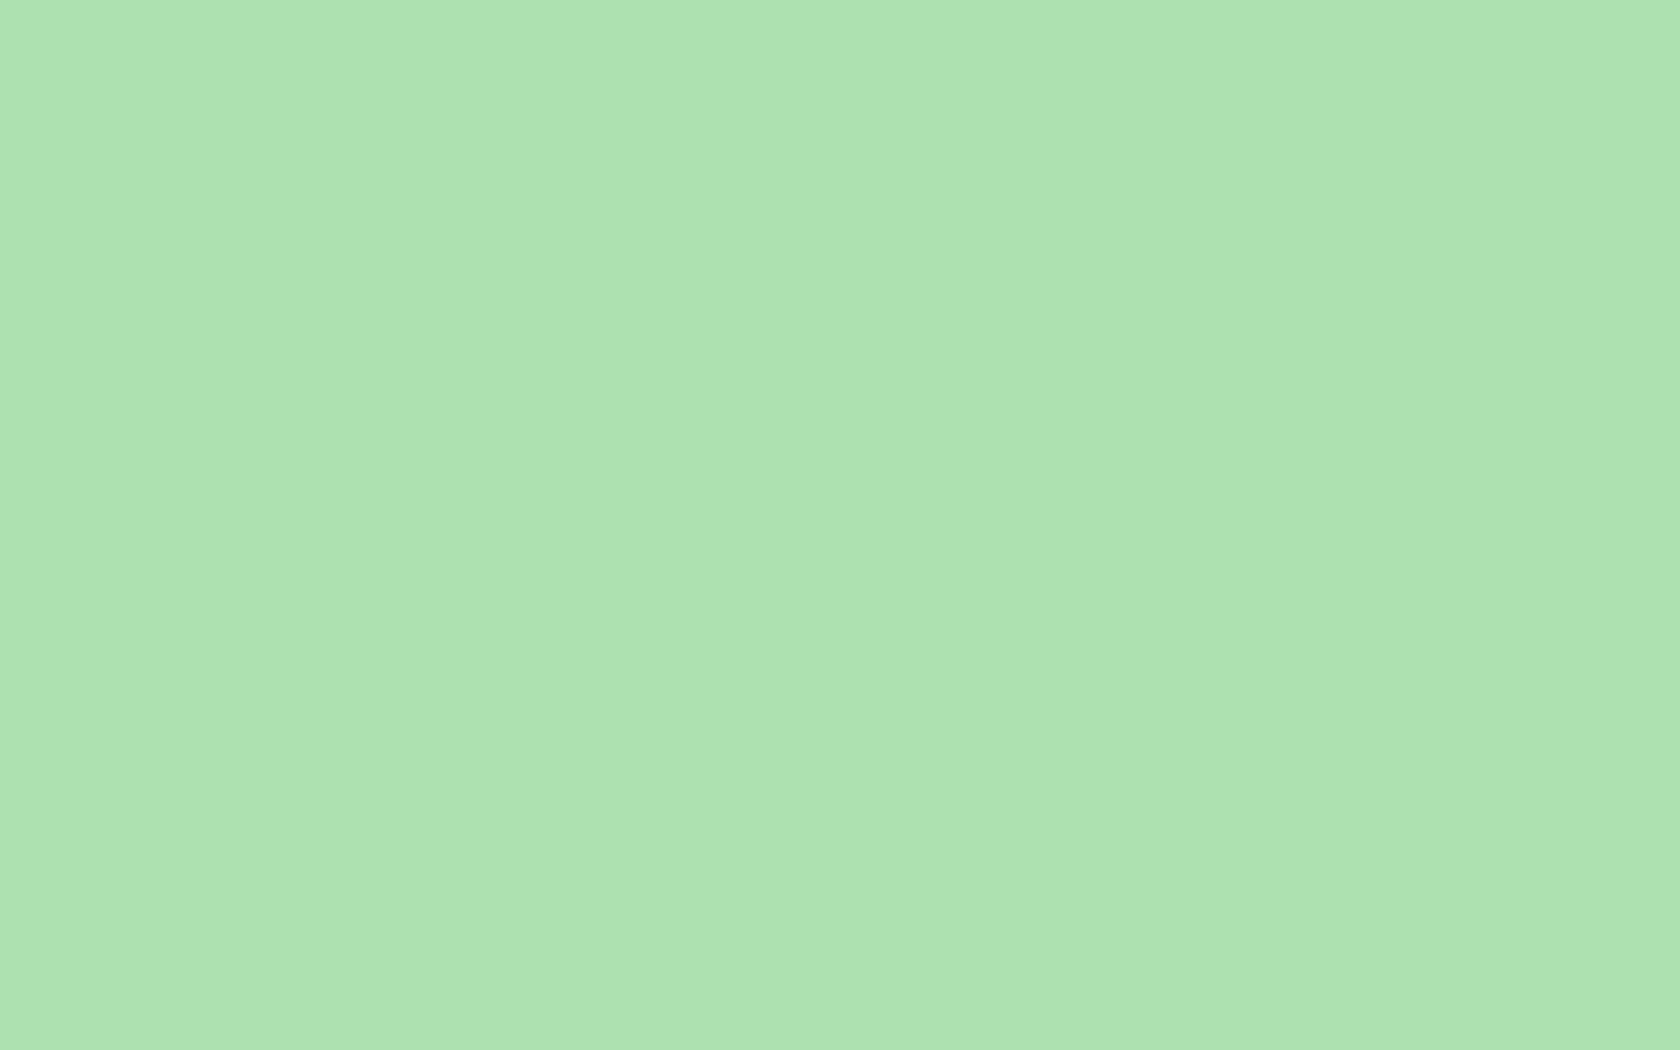 1680x1050 Celadon Solid Color Background